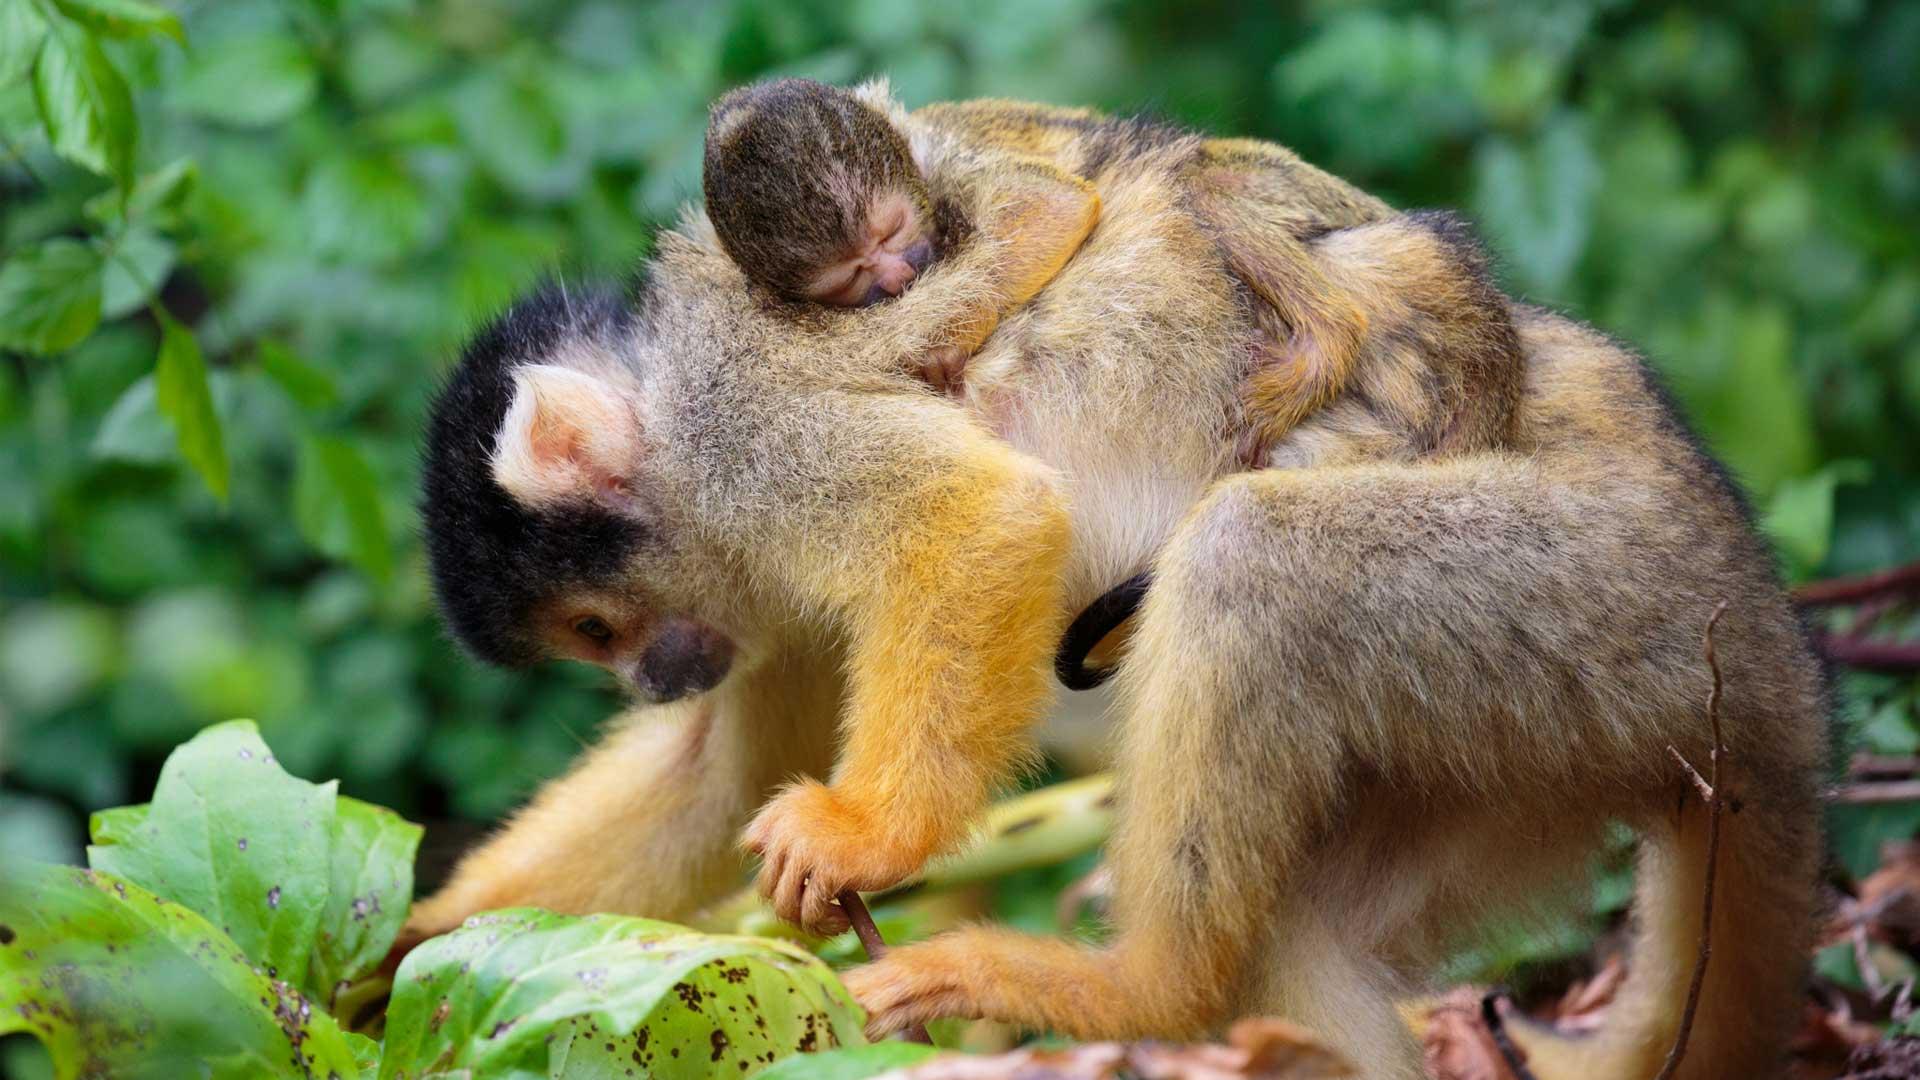 https://rfacdn.nz/zoo/assets/media/squirrel-monkey-picaro-gallery-1.jpg